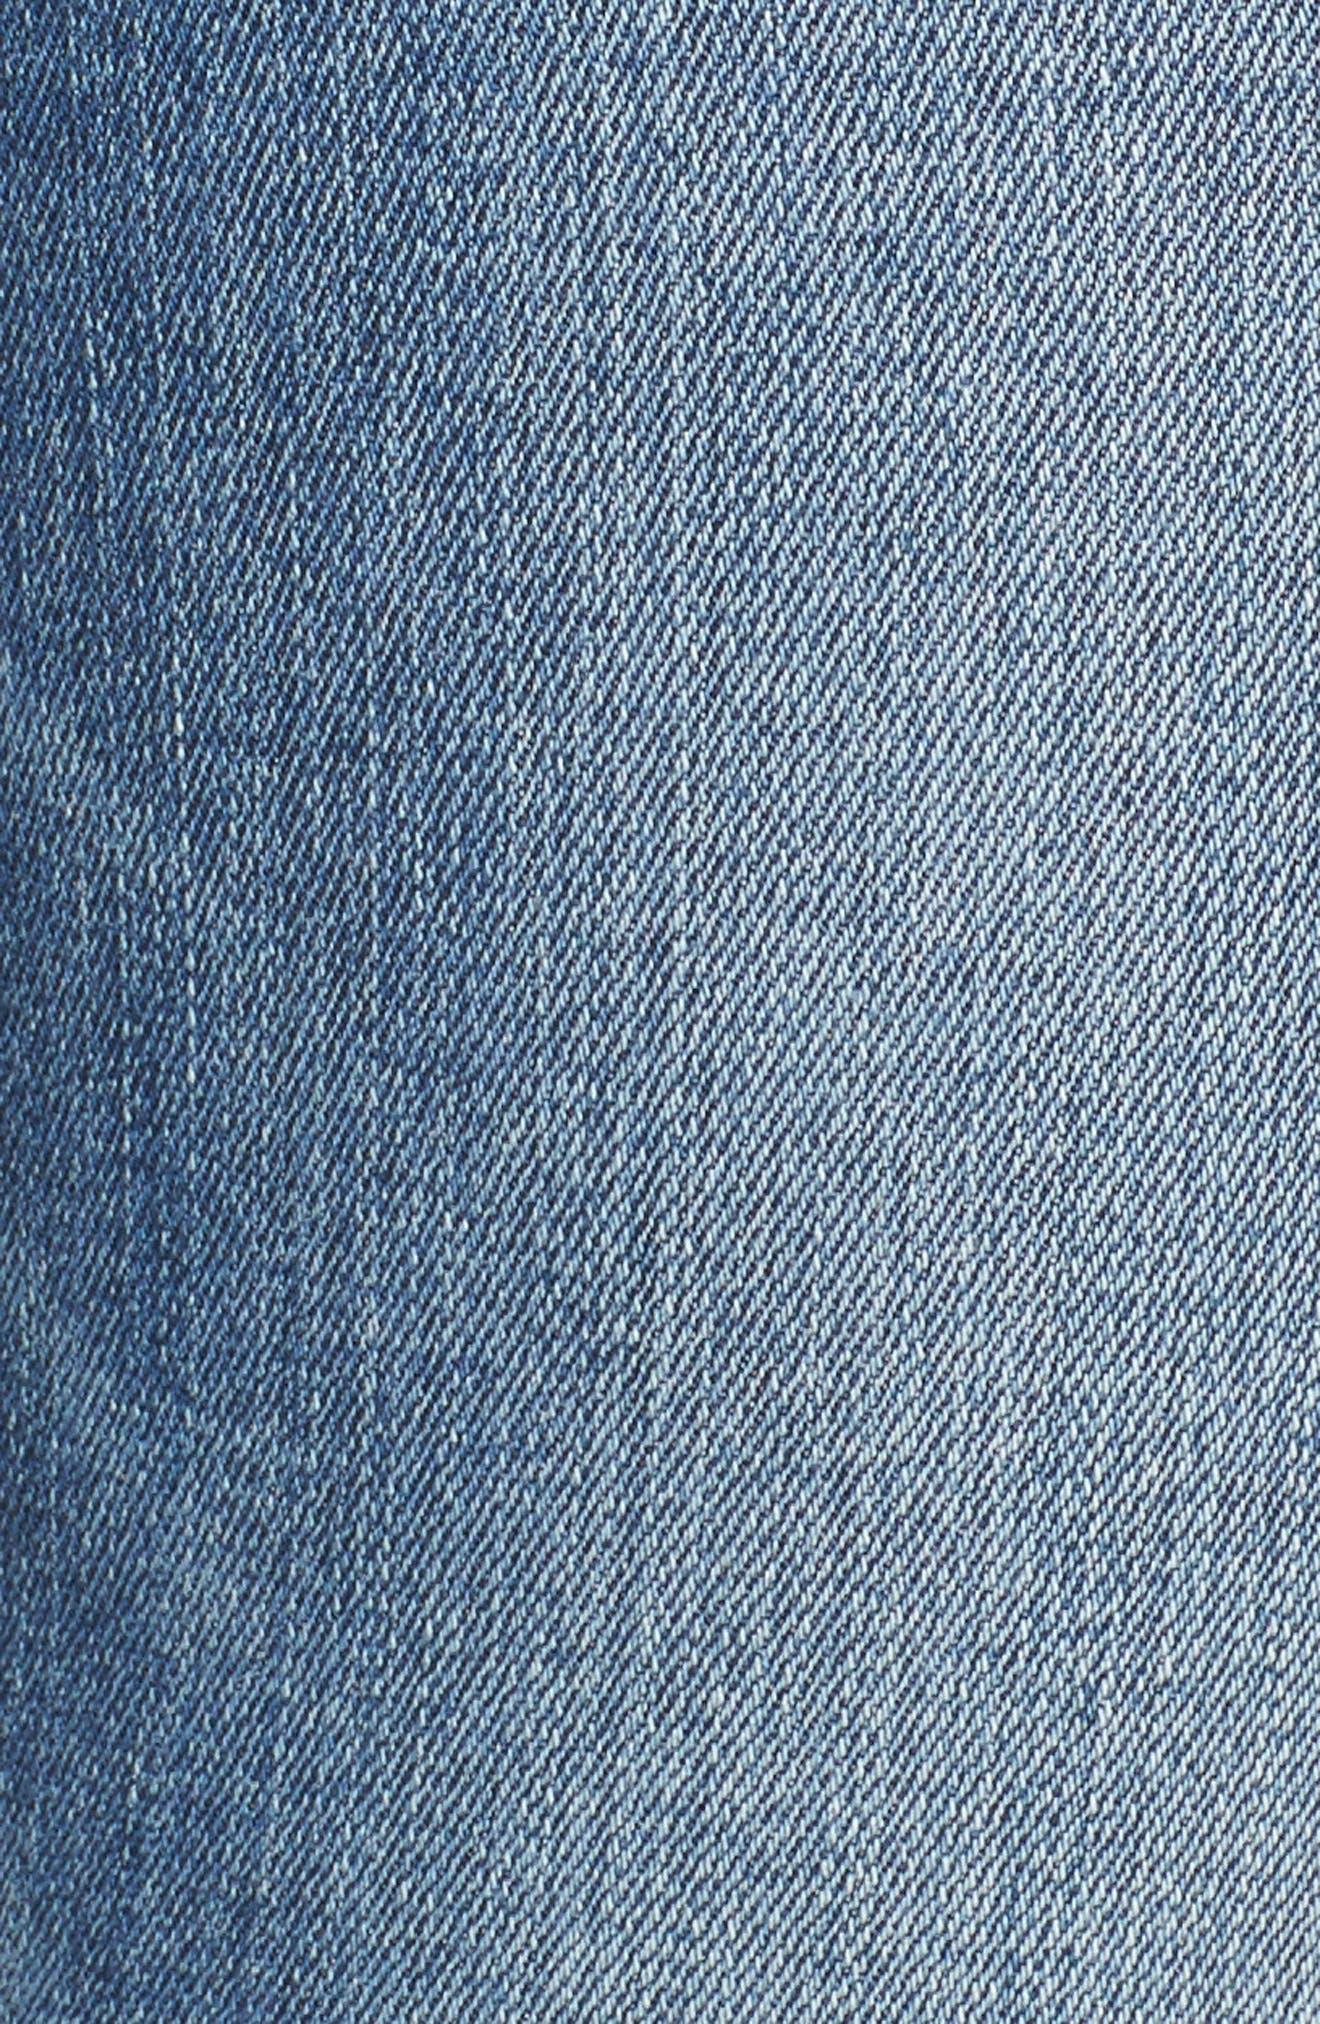 Transcend Vintage - Leggy Ultra Skinny Jeans,                             Alternate thumbnail 6, color,                             Rissy